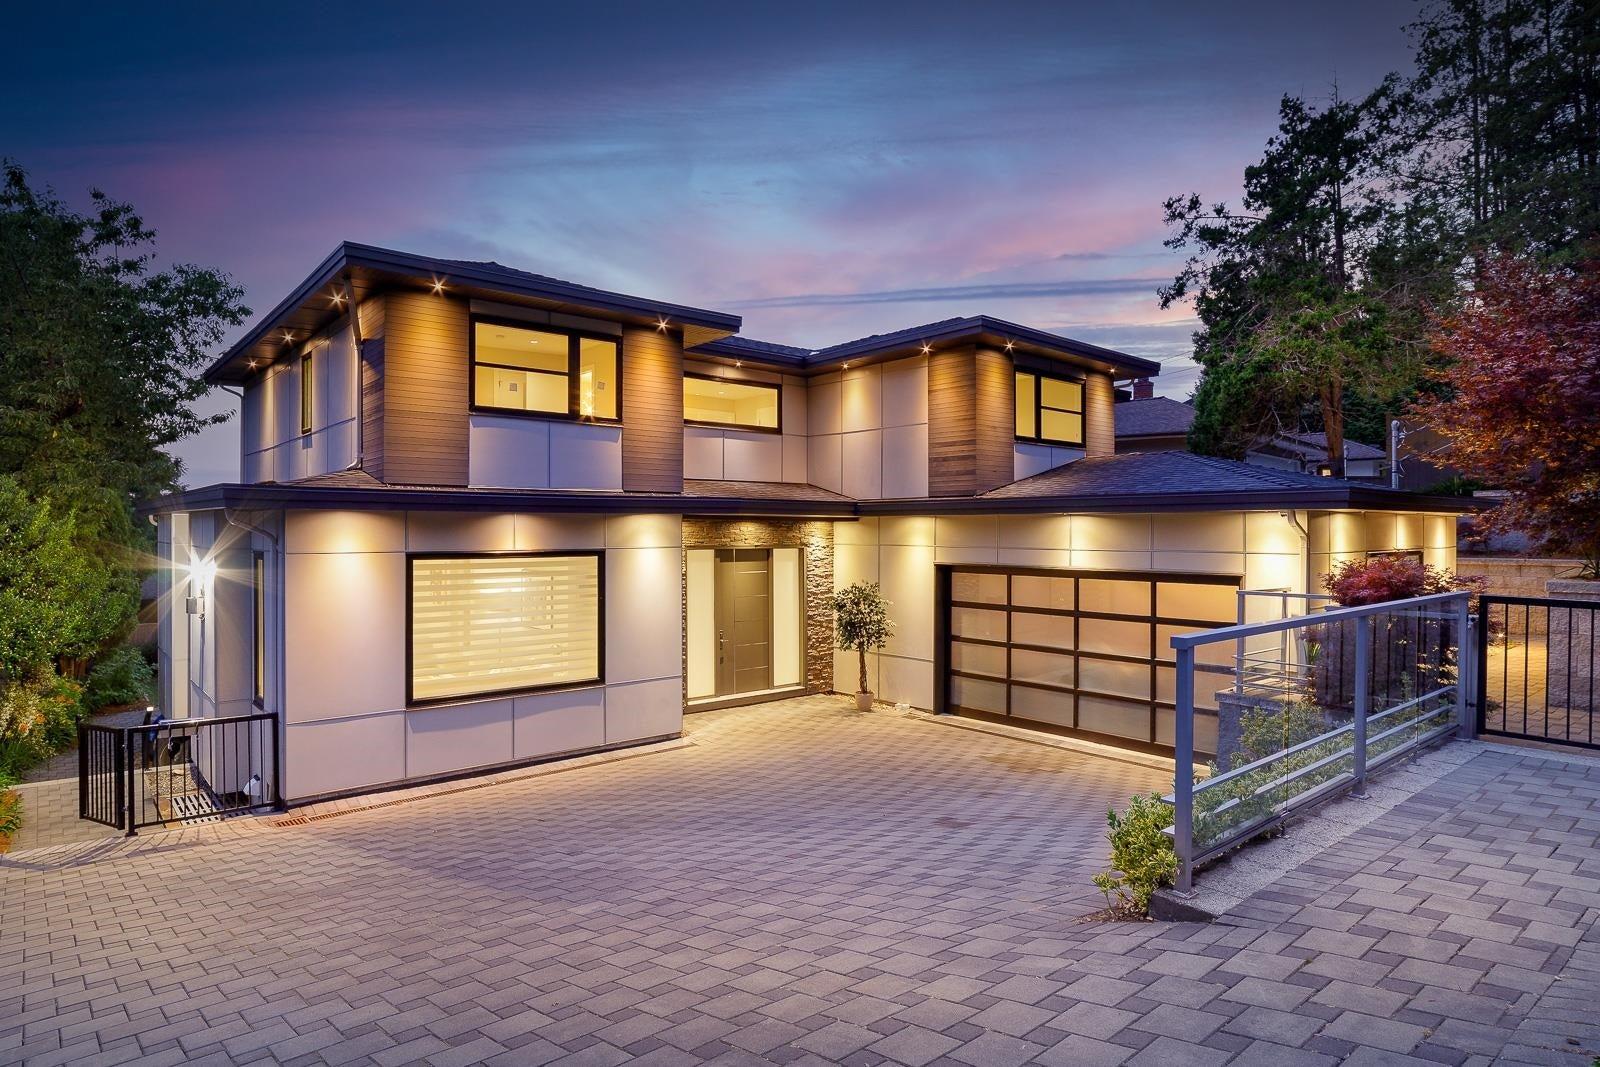 517 GRANADA CRESCENT - Upper Delbrook House/Single Family for sale, 8 Bedrooms (R2615057) - #1